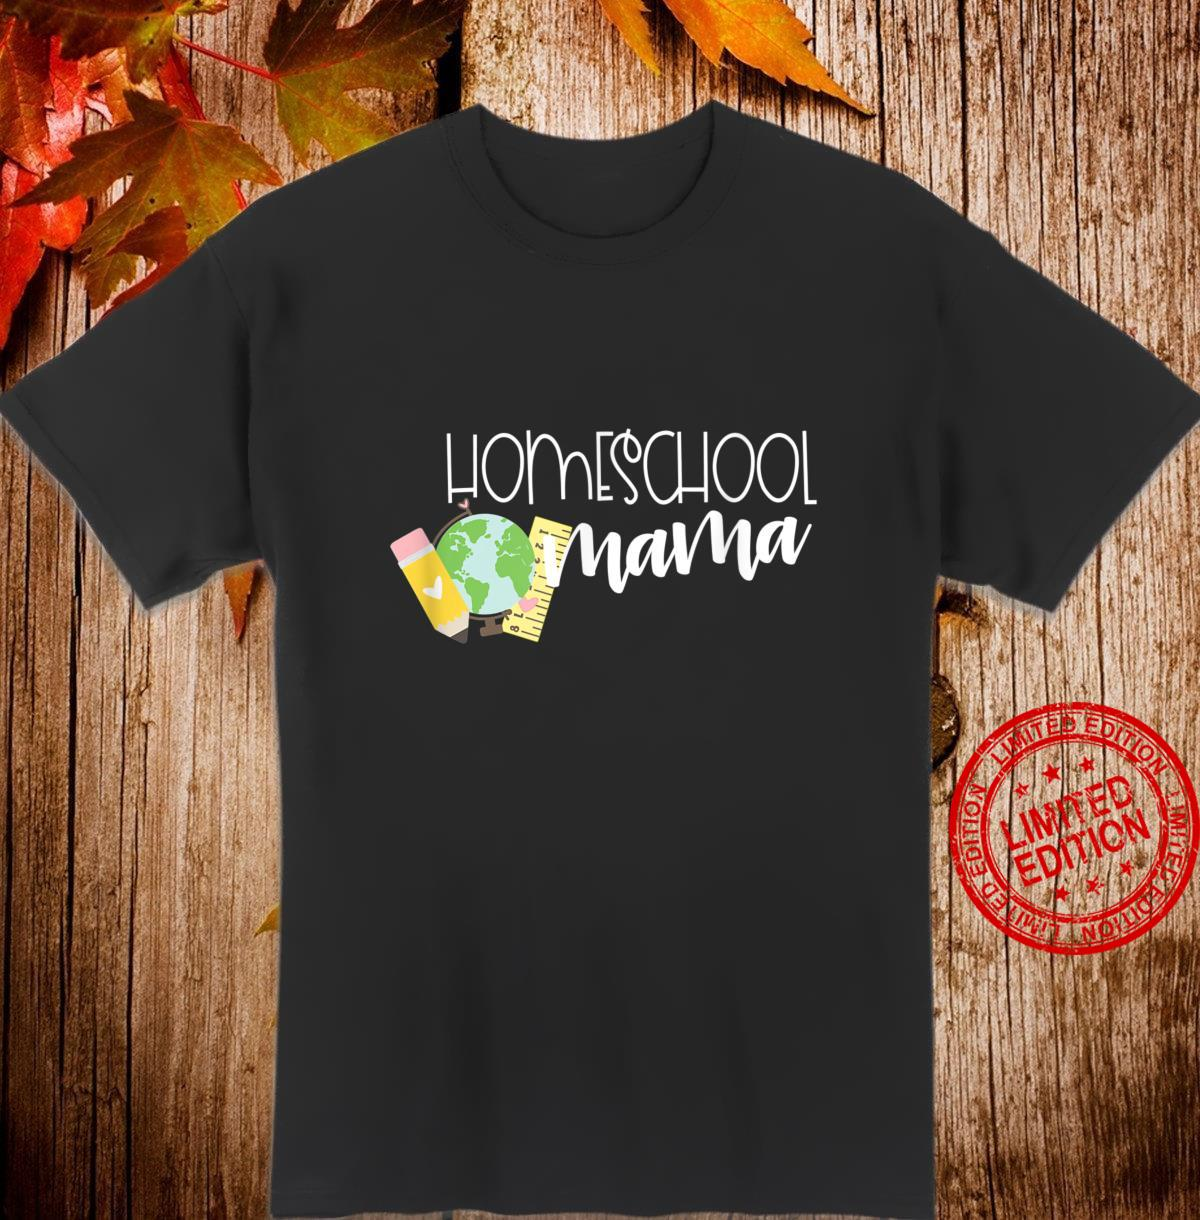 HOMESCHOOL MAMA with Cute School Supplies Shirt